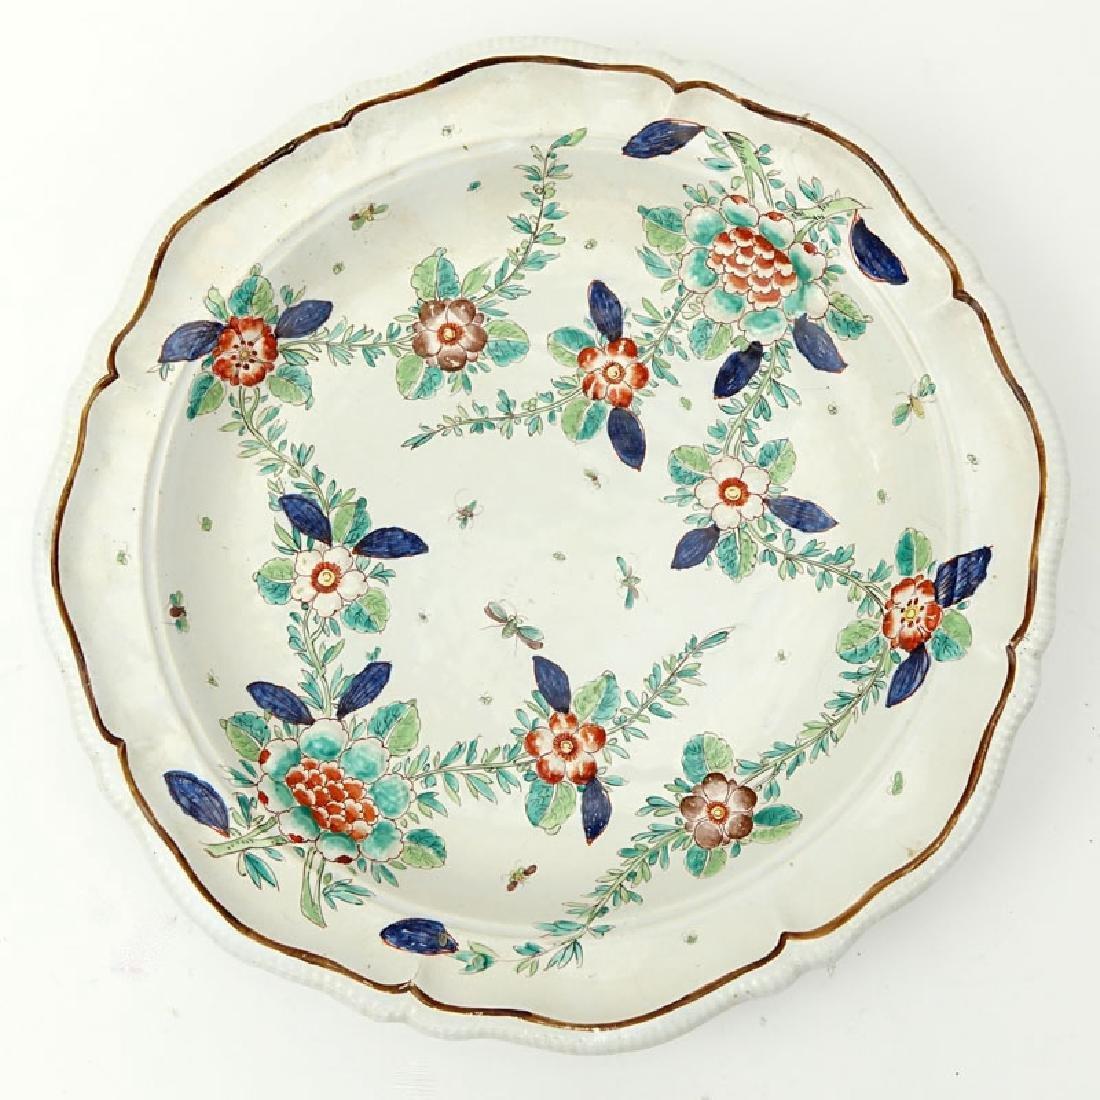 Antique Faience Raised Flower Hand Painted Ceramic - 2